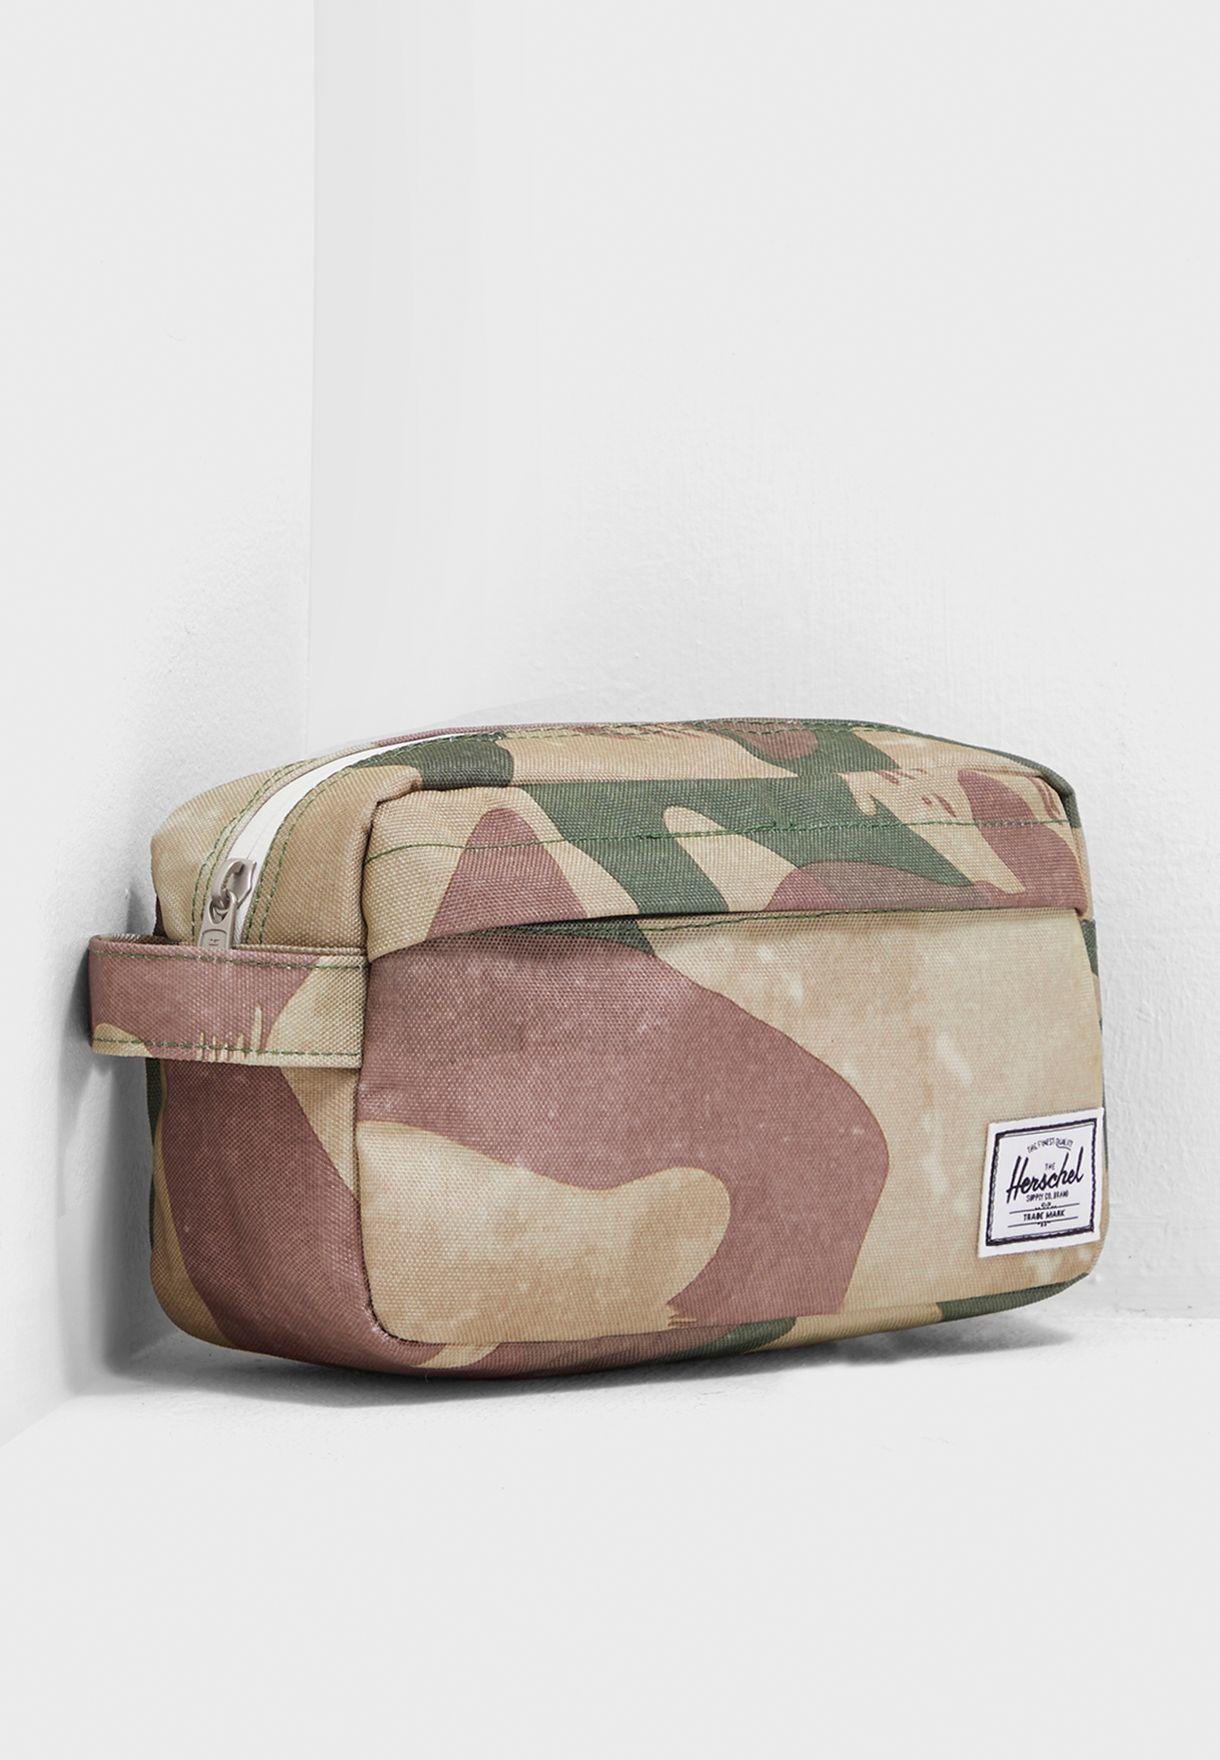 d266c4ed159d Shop Herschel prints Chapter Carry On Toiletry Bag 10347-02460-OS ...